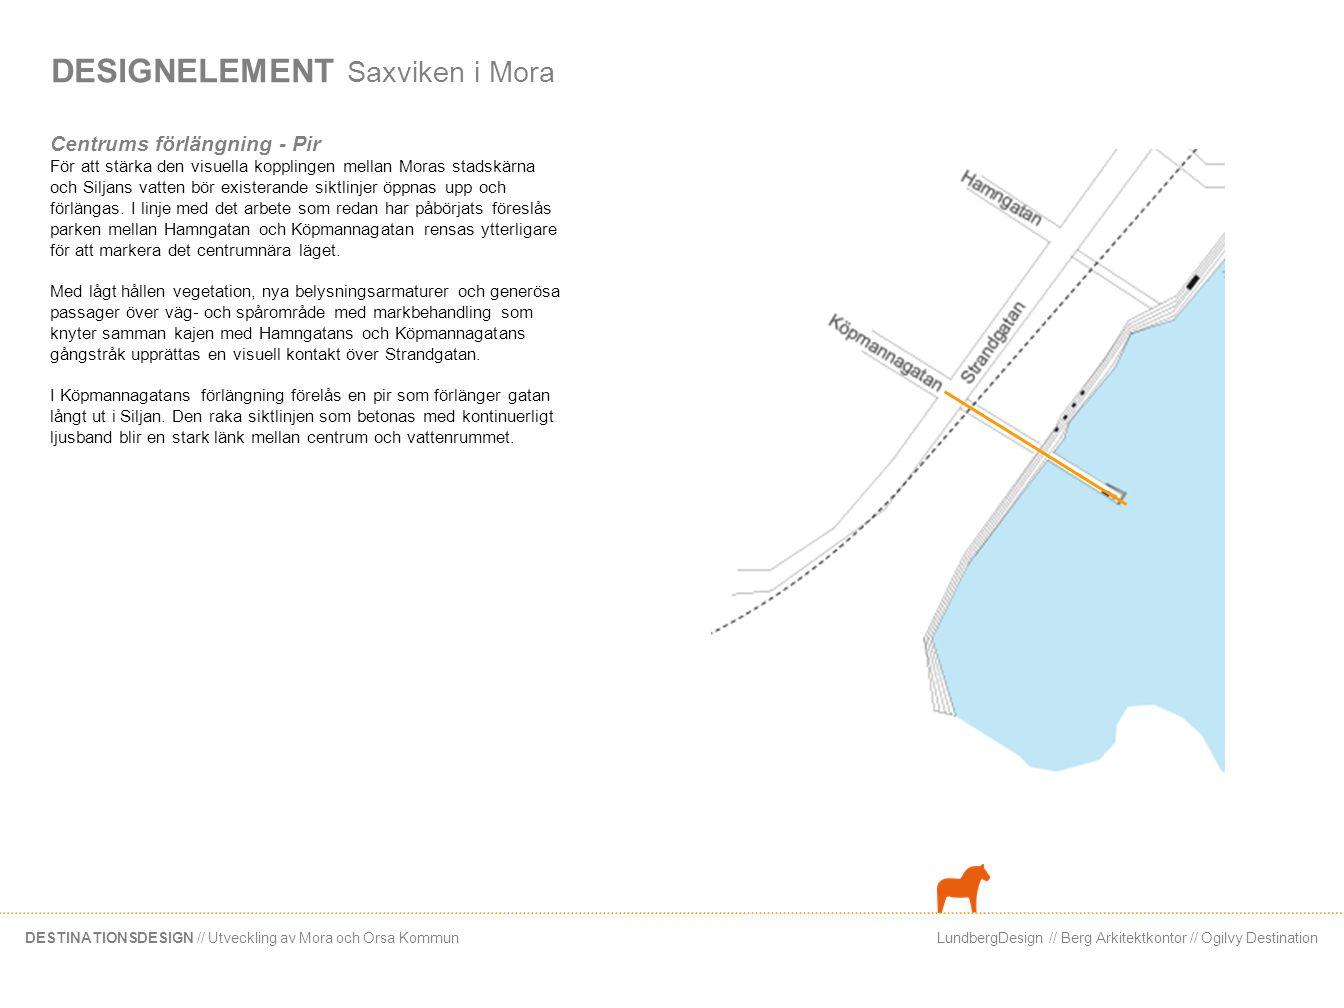 LundbergDesign // Berg Arkitektkontor // Ogilvy DestinationDESTINATIONSDESIGN // Utveckling av Mora och Orsa Kommun DESIGNELEMENT Saxviken i Mora Cent